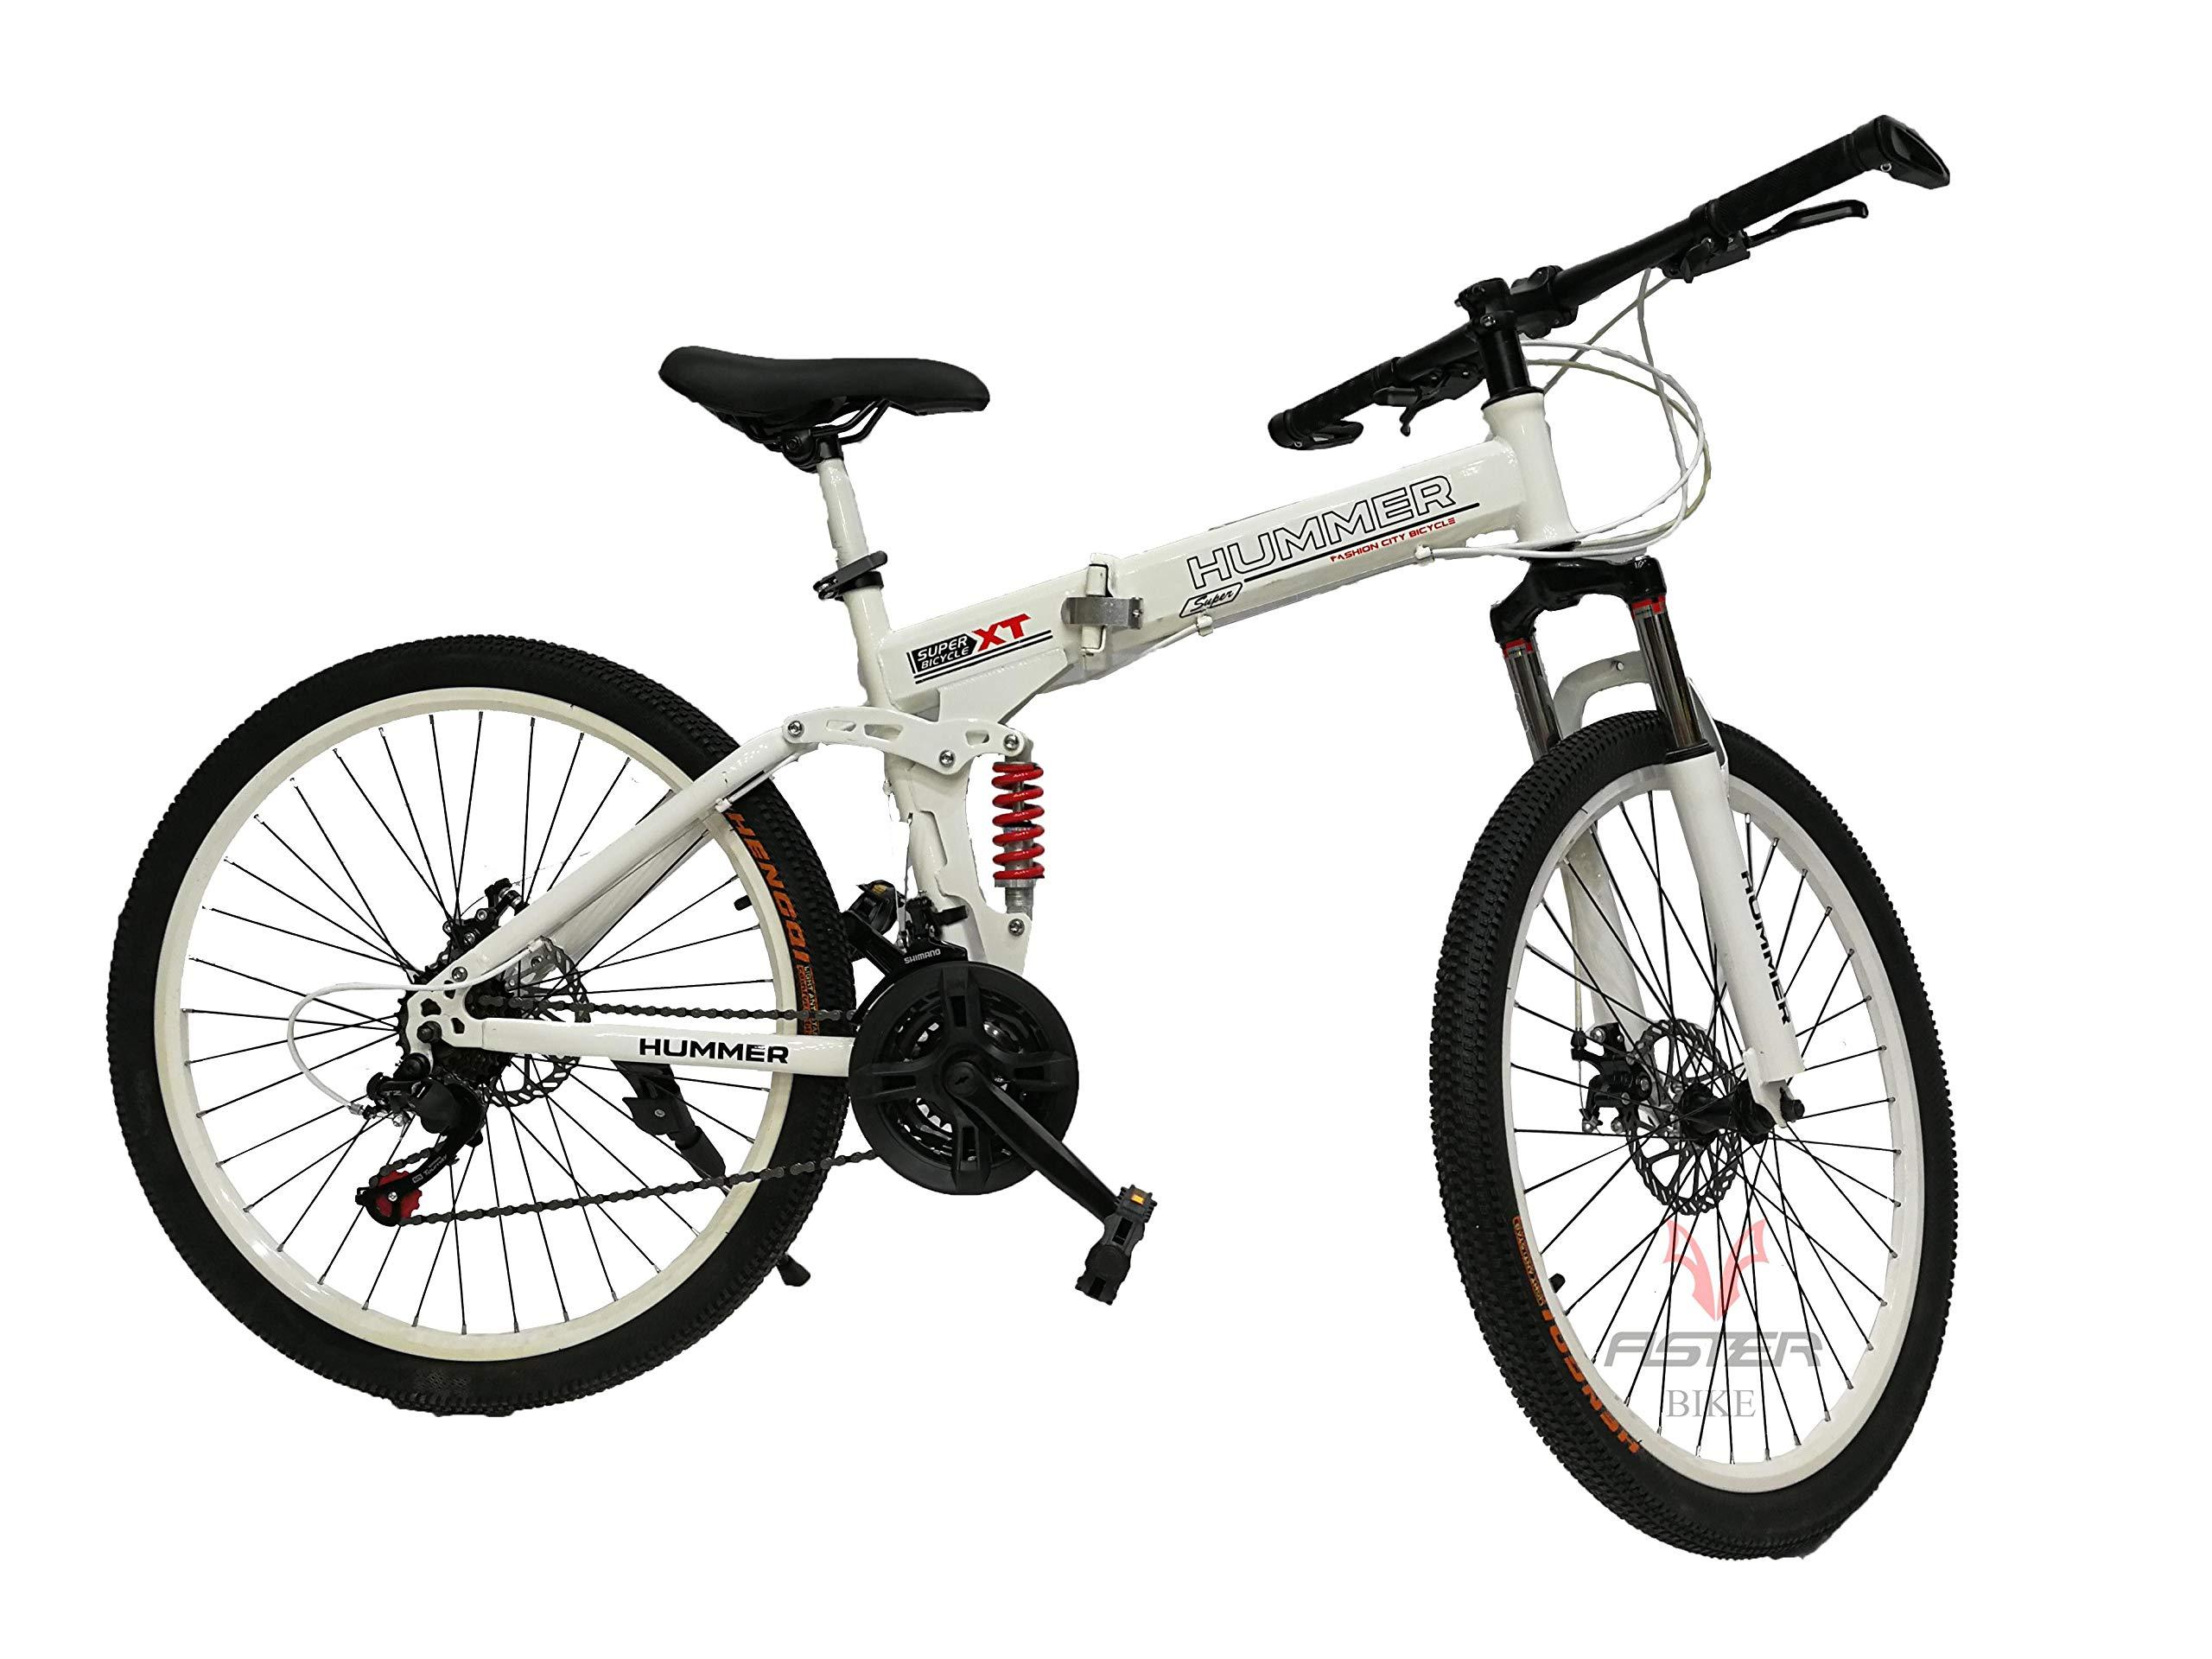 Hummer mountain bike double shock folding bicycle. white ...   hummer folding bikes